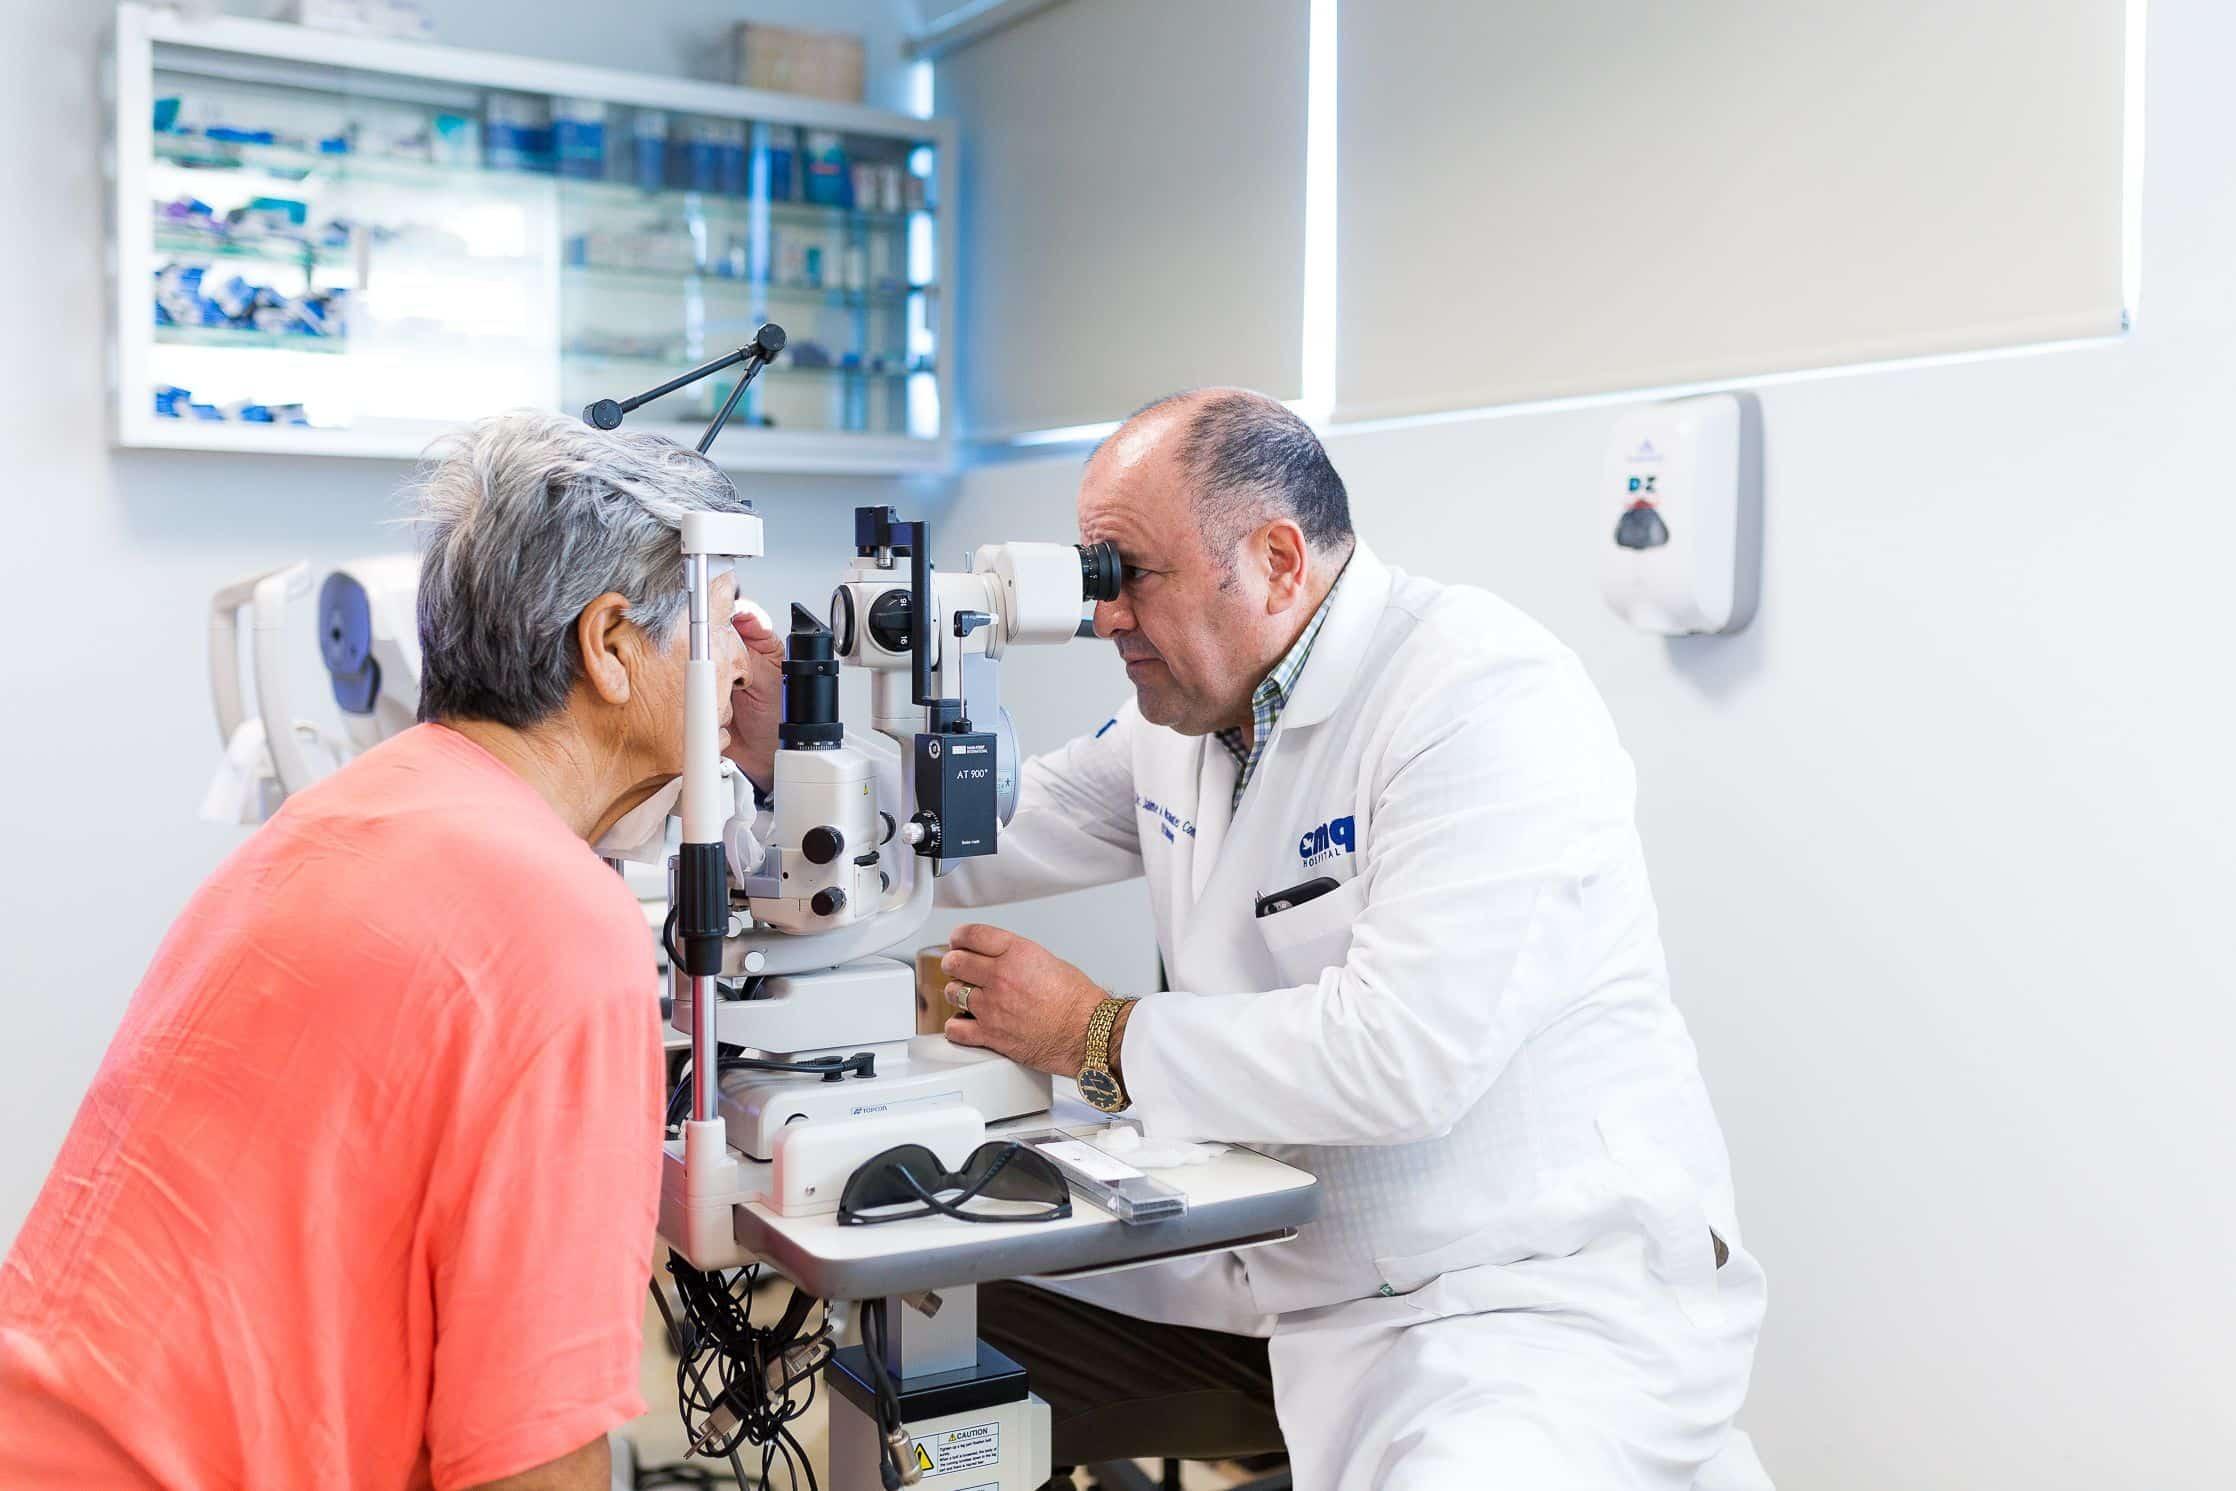 Dr. Jaime Aniceto Miramontes, ophthalmologist